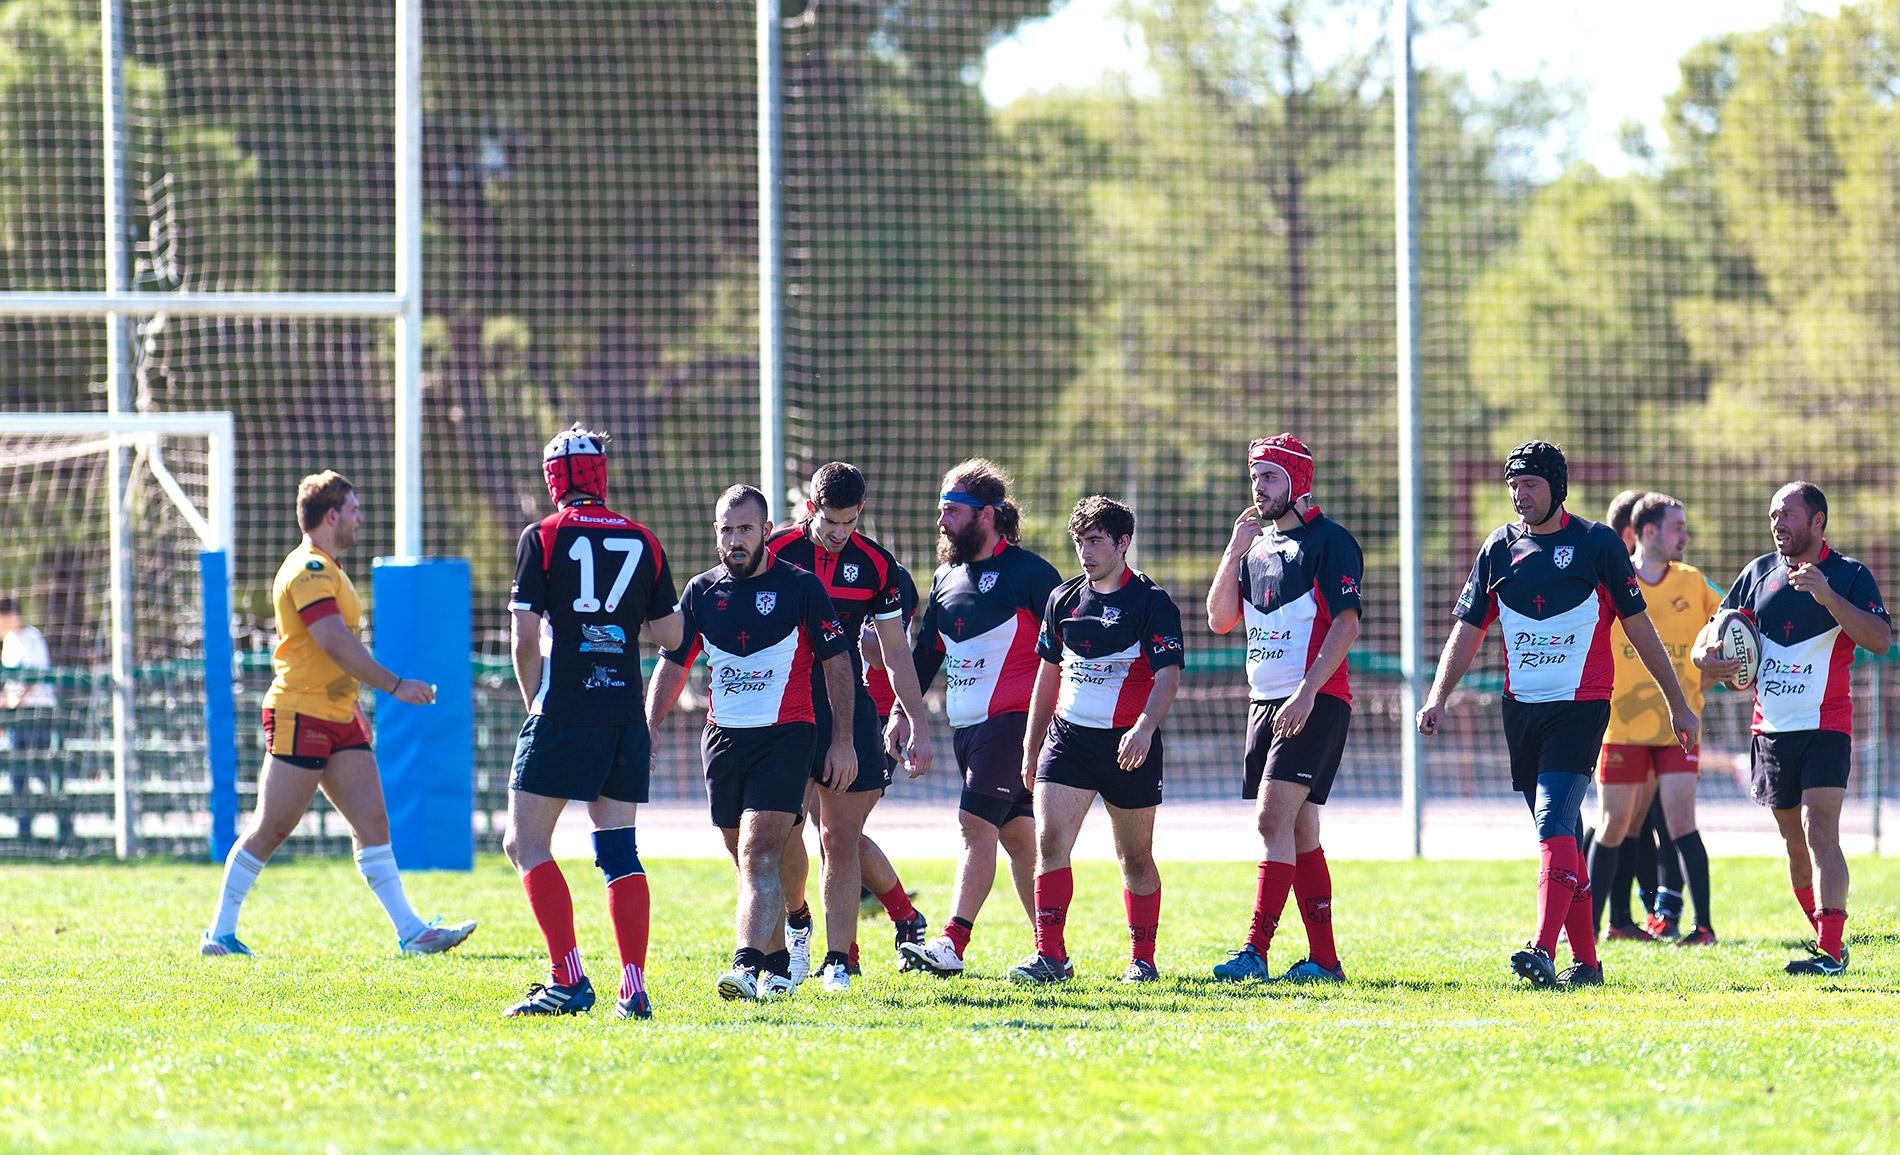 DSC1087_15539.-Rugby.-Reeditada-dic-2019.